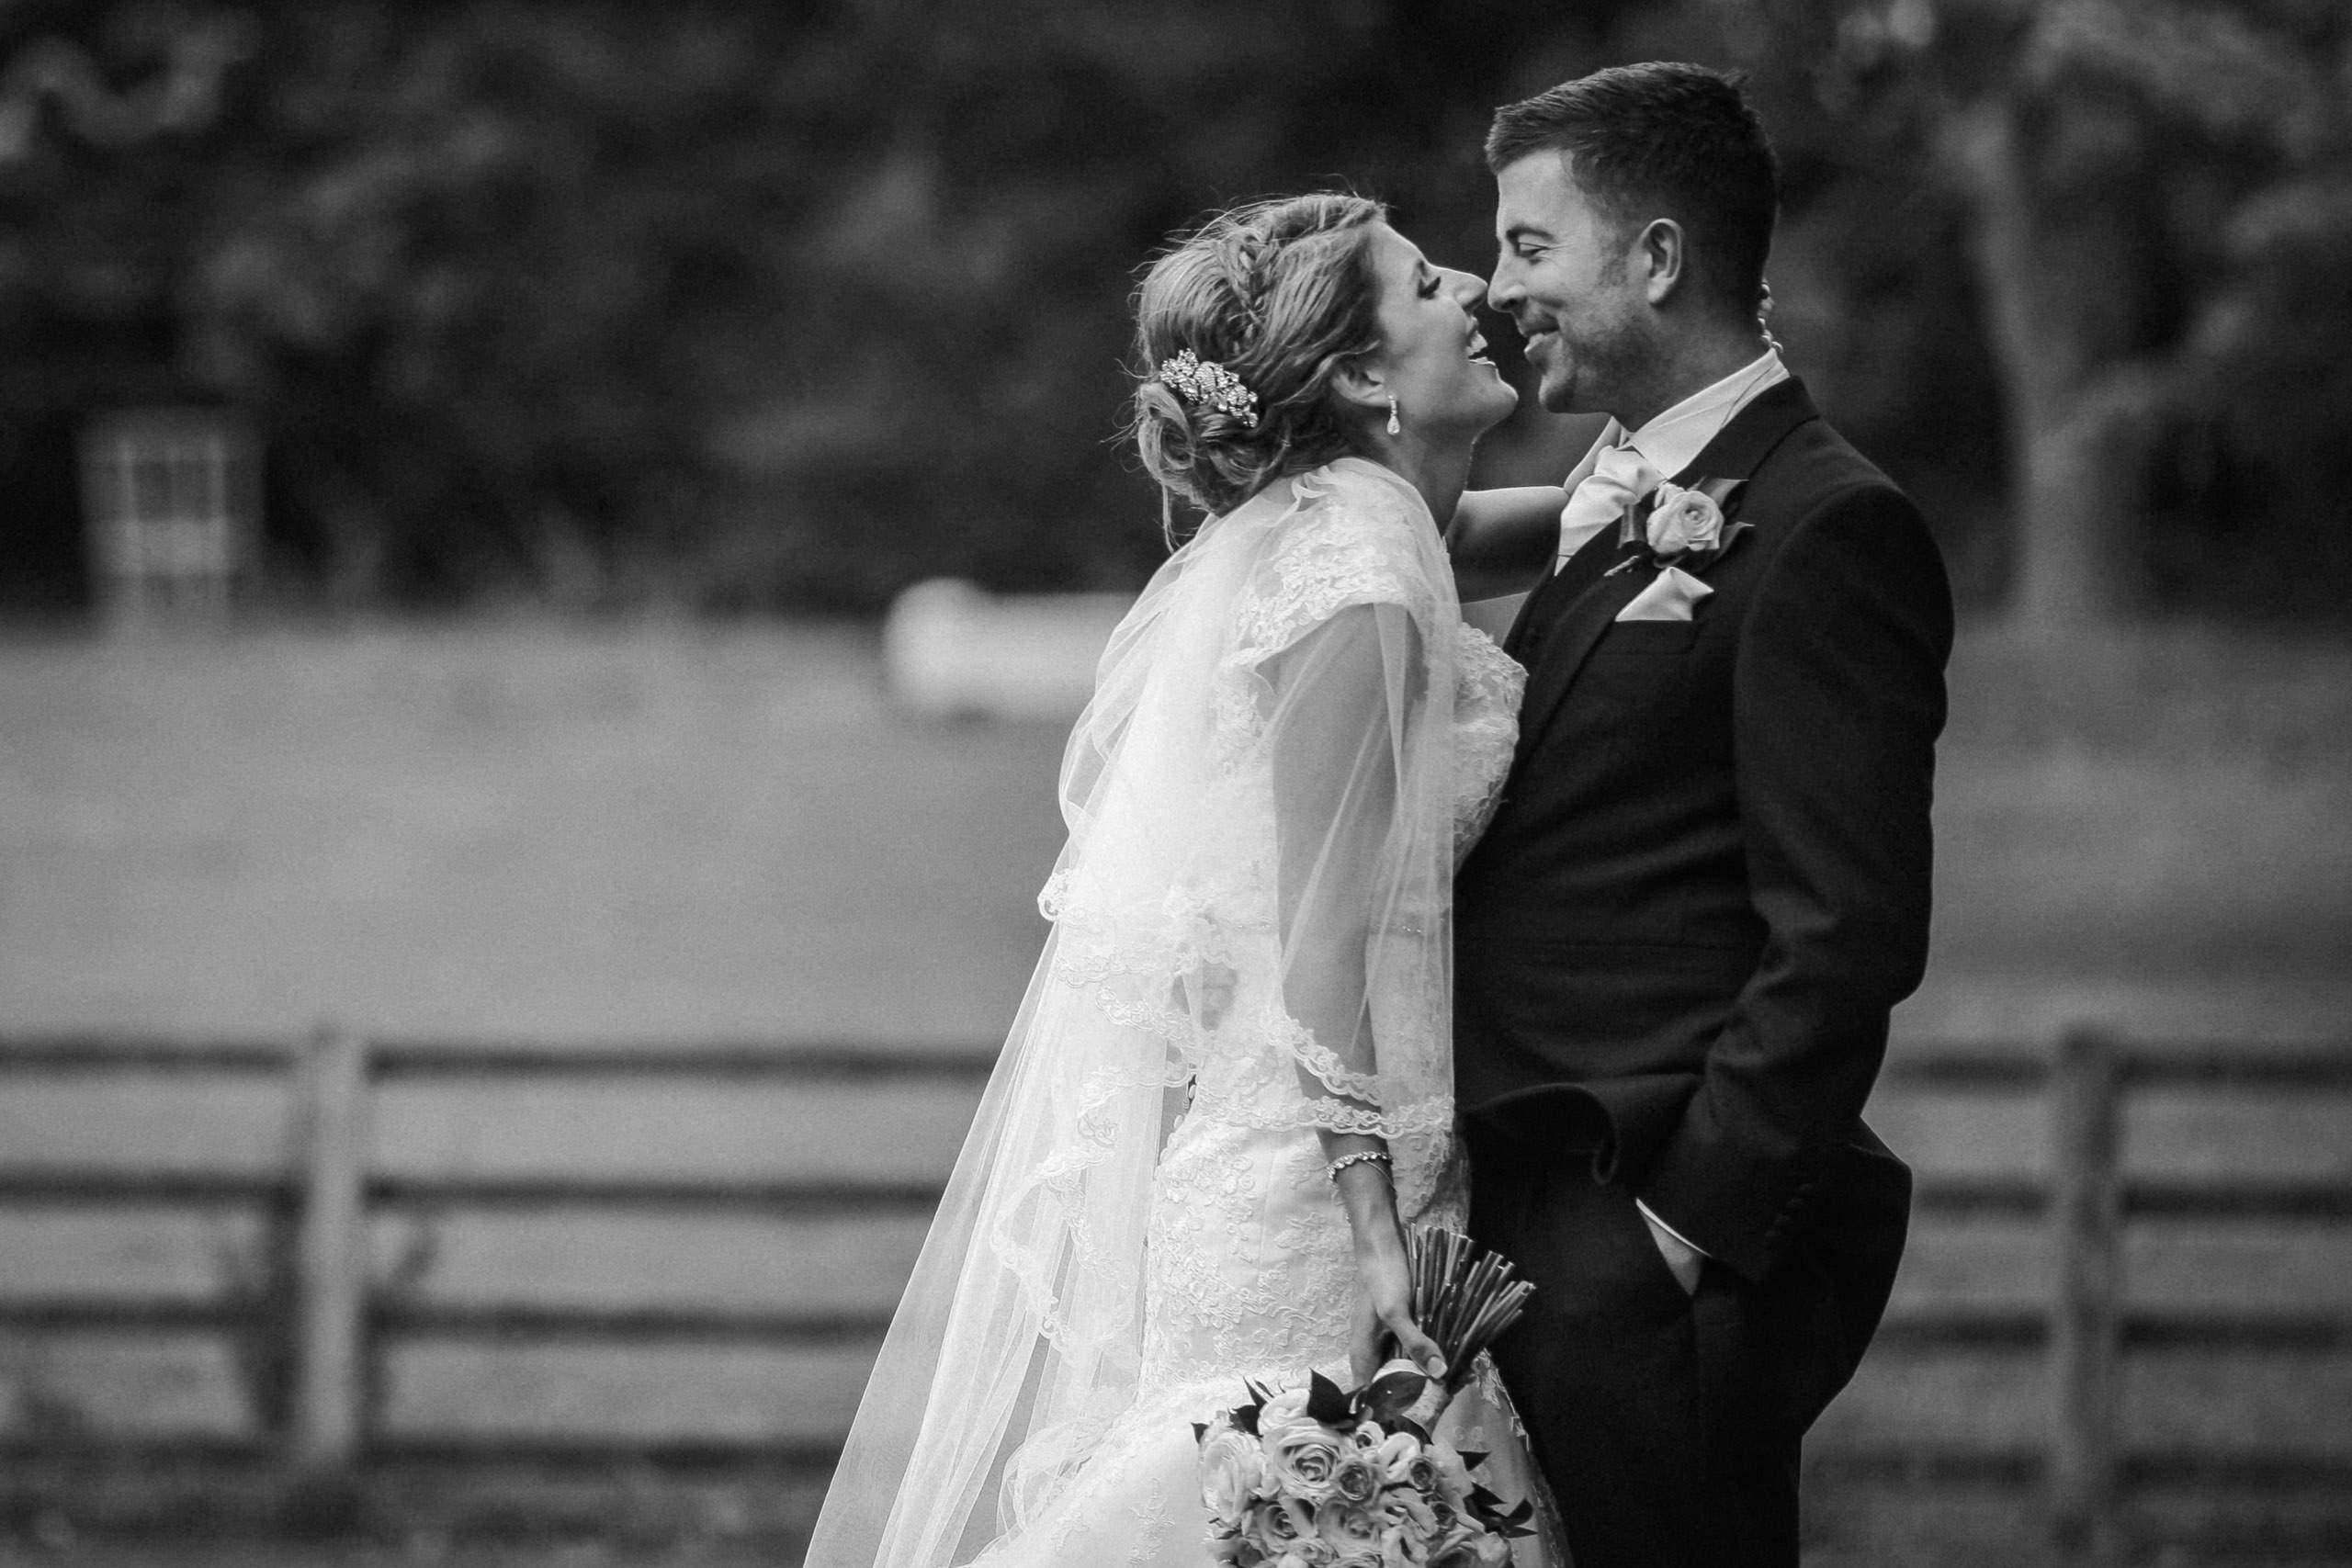 Happy Bride and Groom Soughton Hall Cheshire wedding